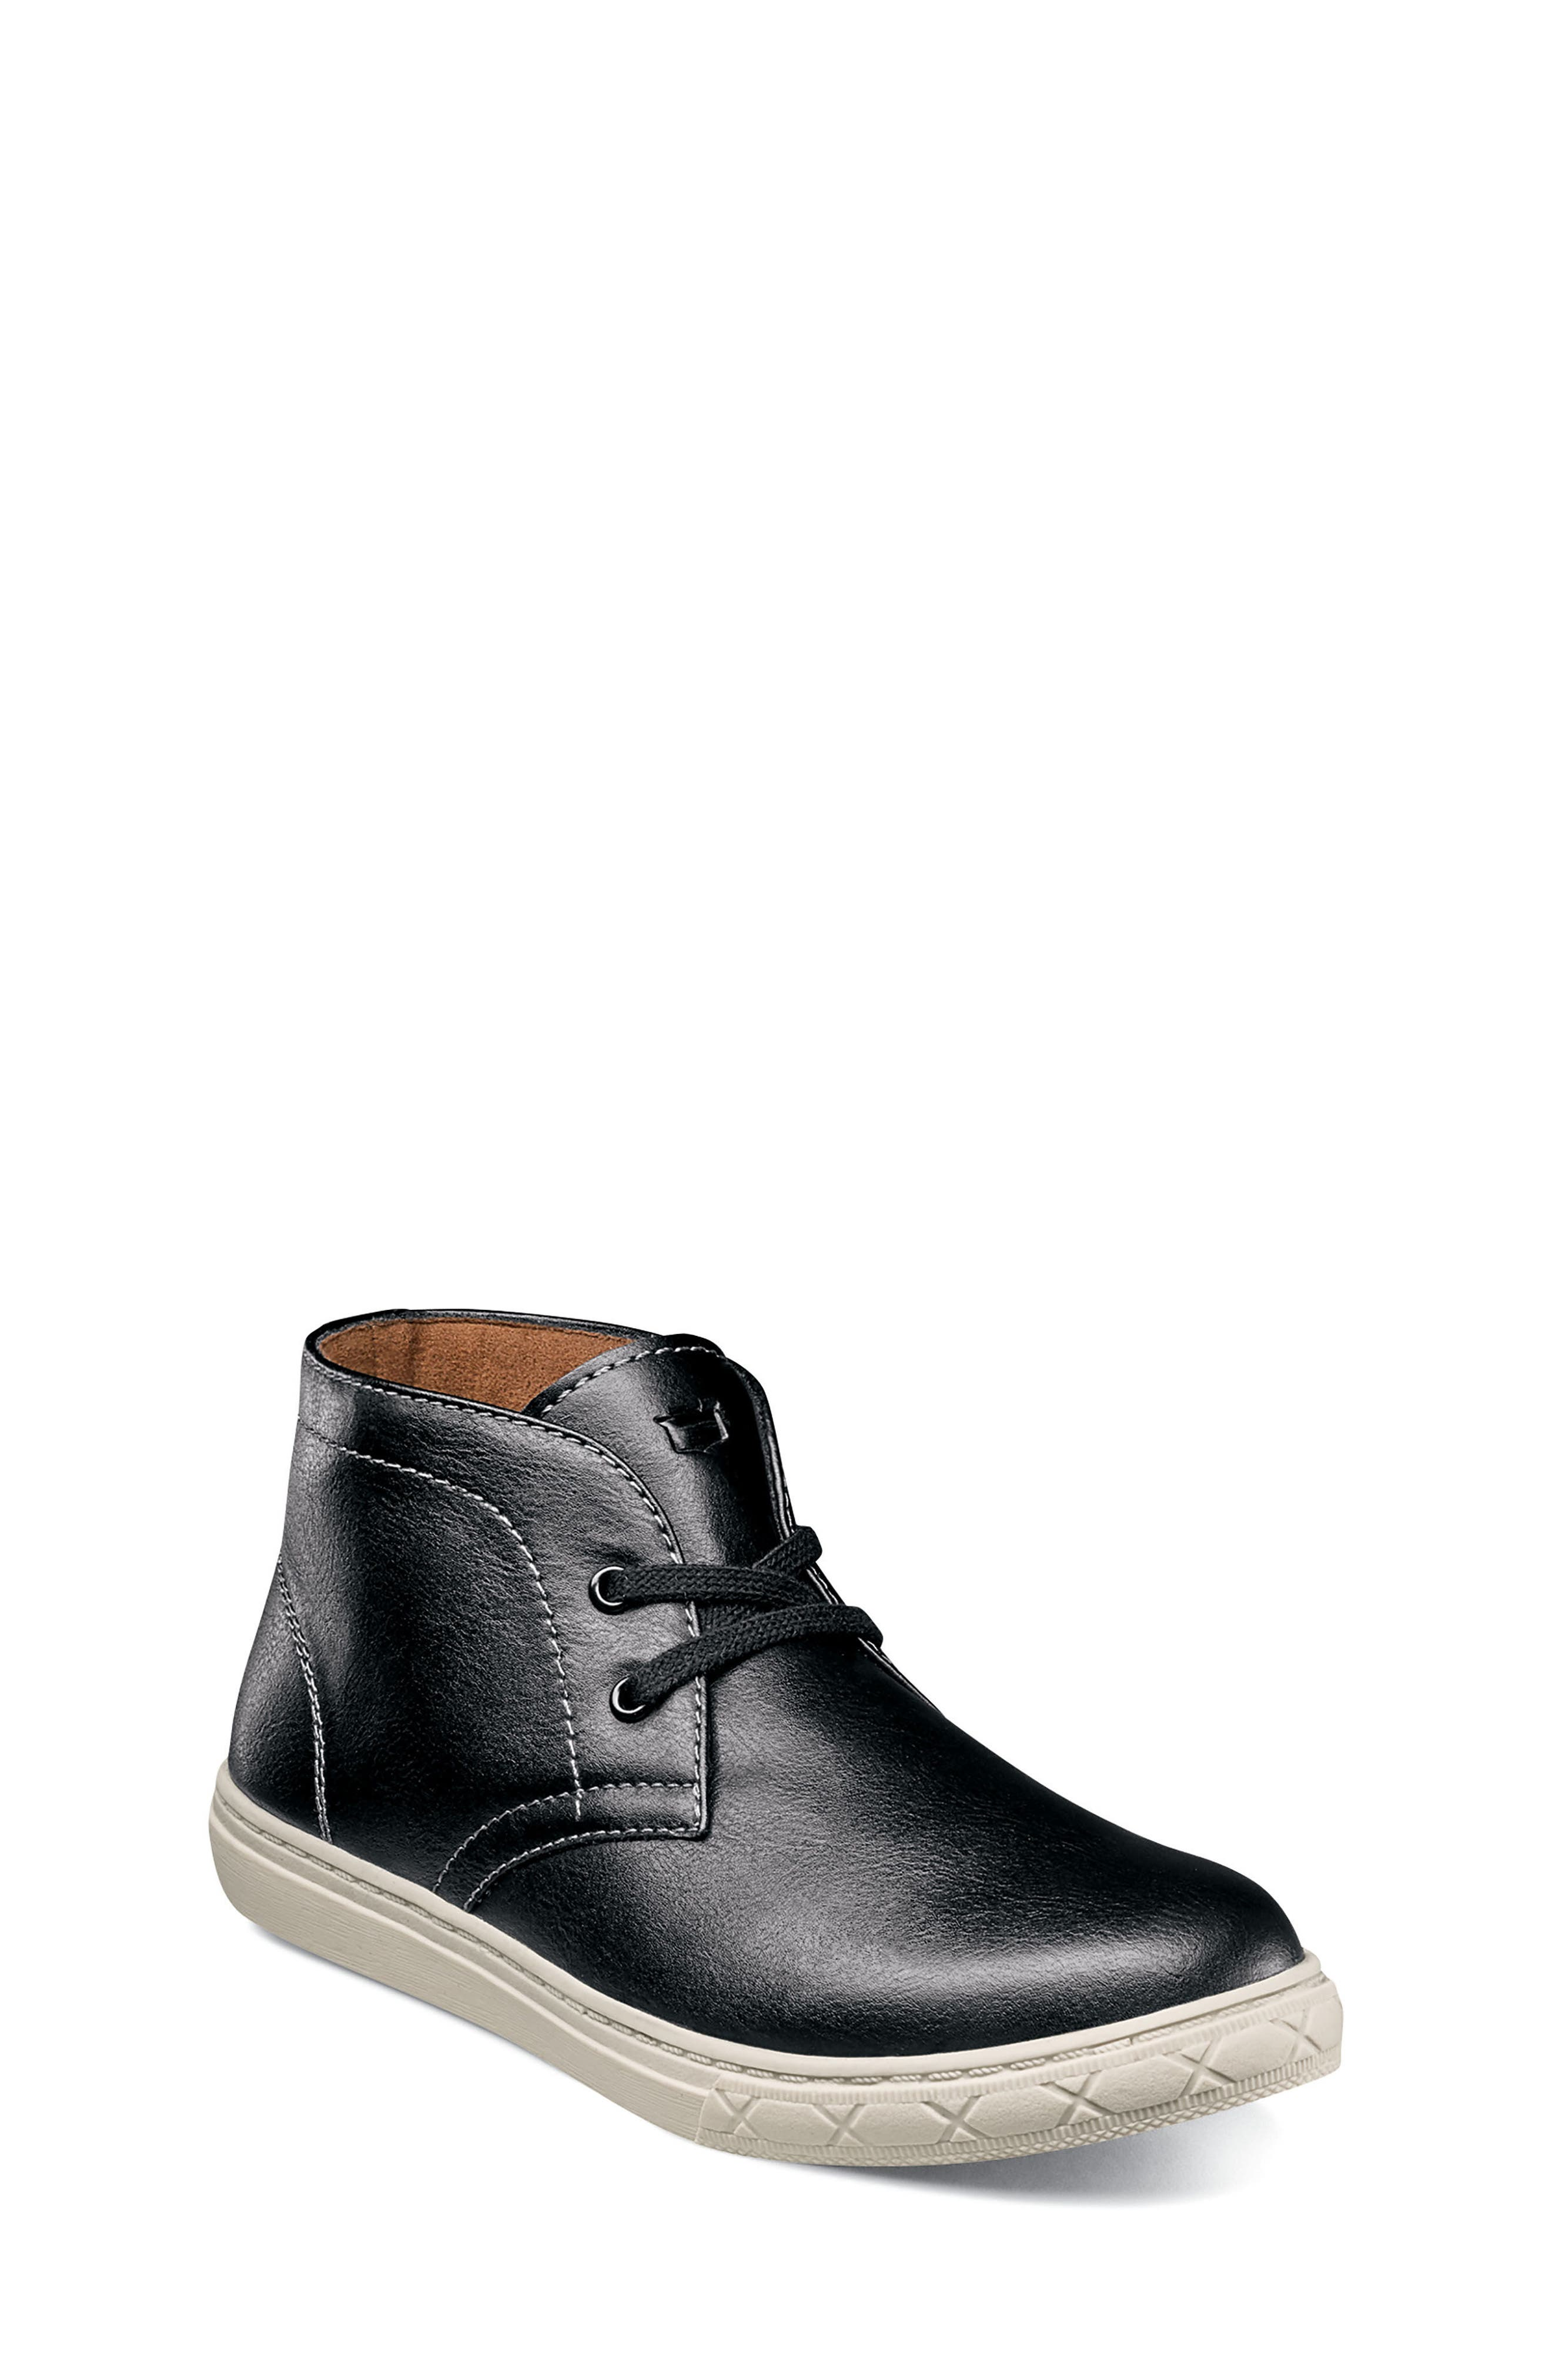 FLORSHEIM Curb Chukka Sneaker Boot, Main, color, 001